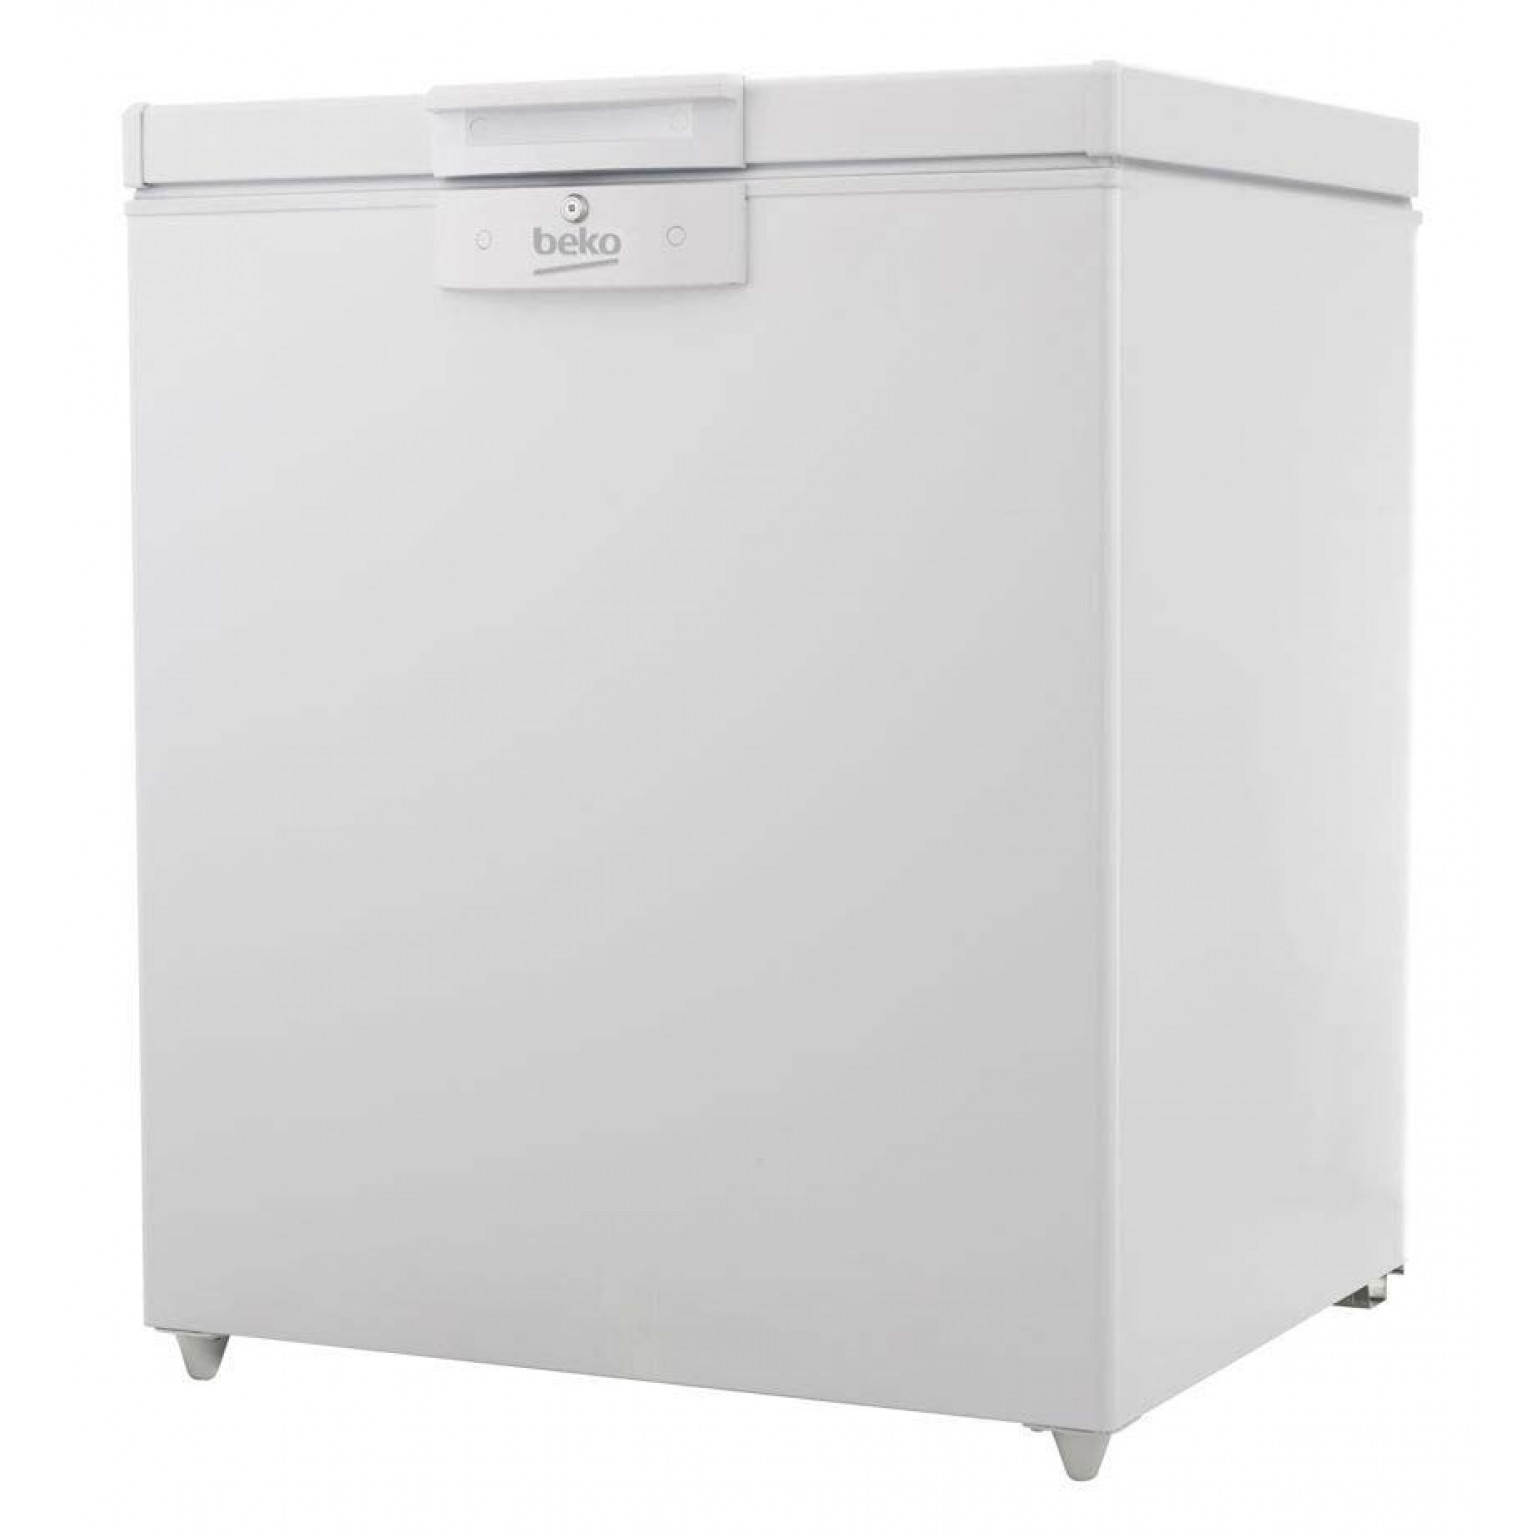 Beko Freestanding Chest Freezer   CF625